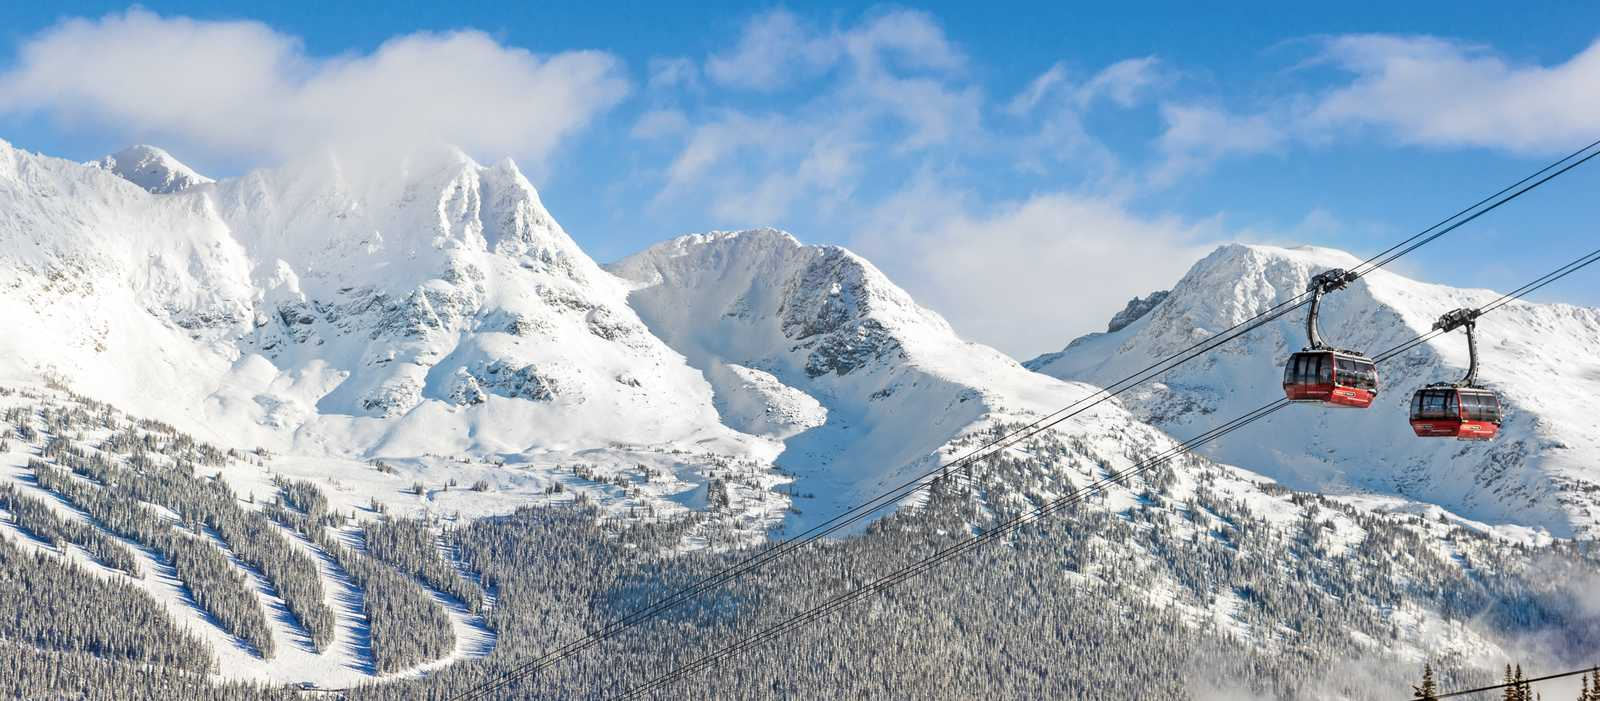 Skilift vor beeindruckendem Bergpanorama